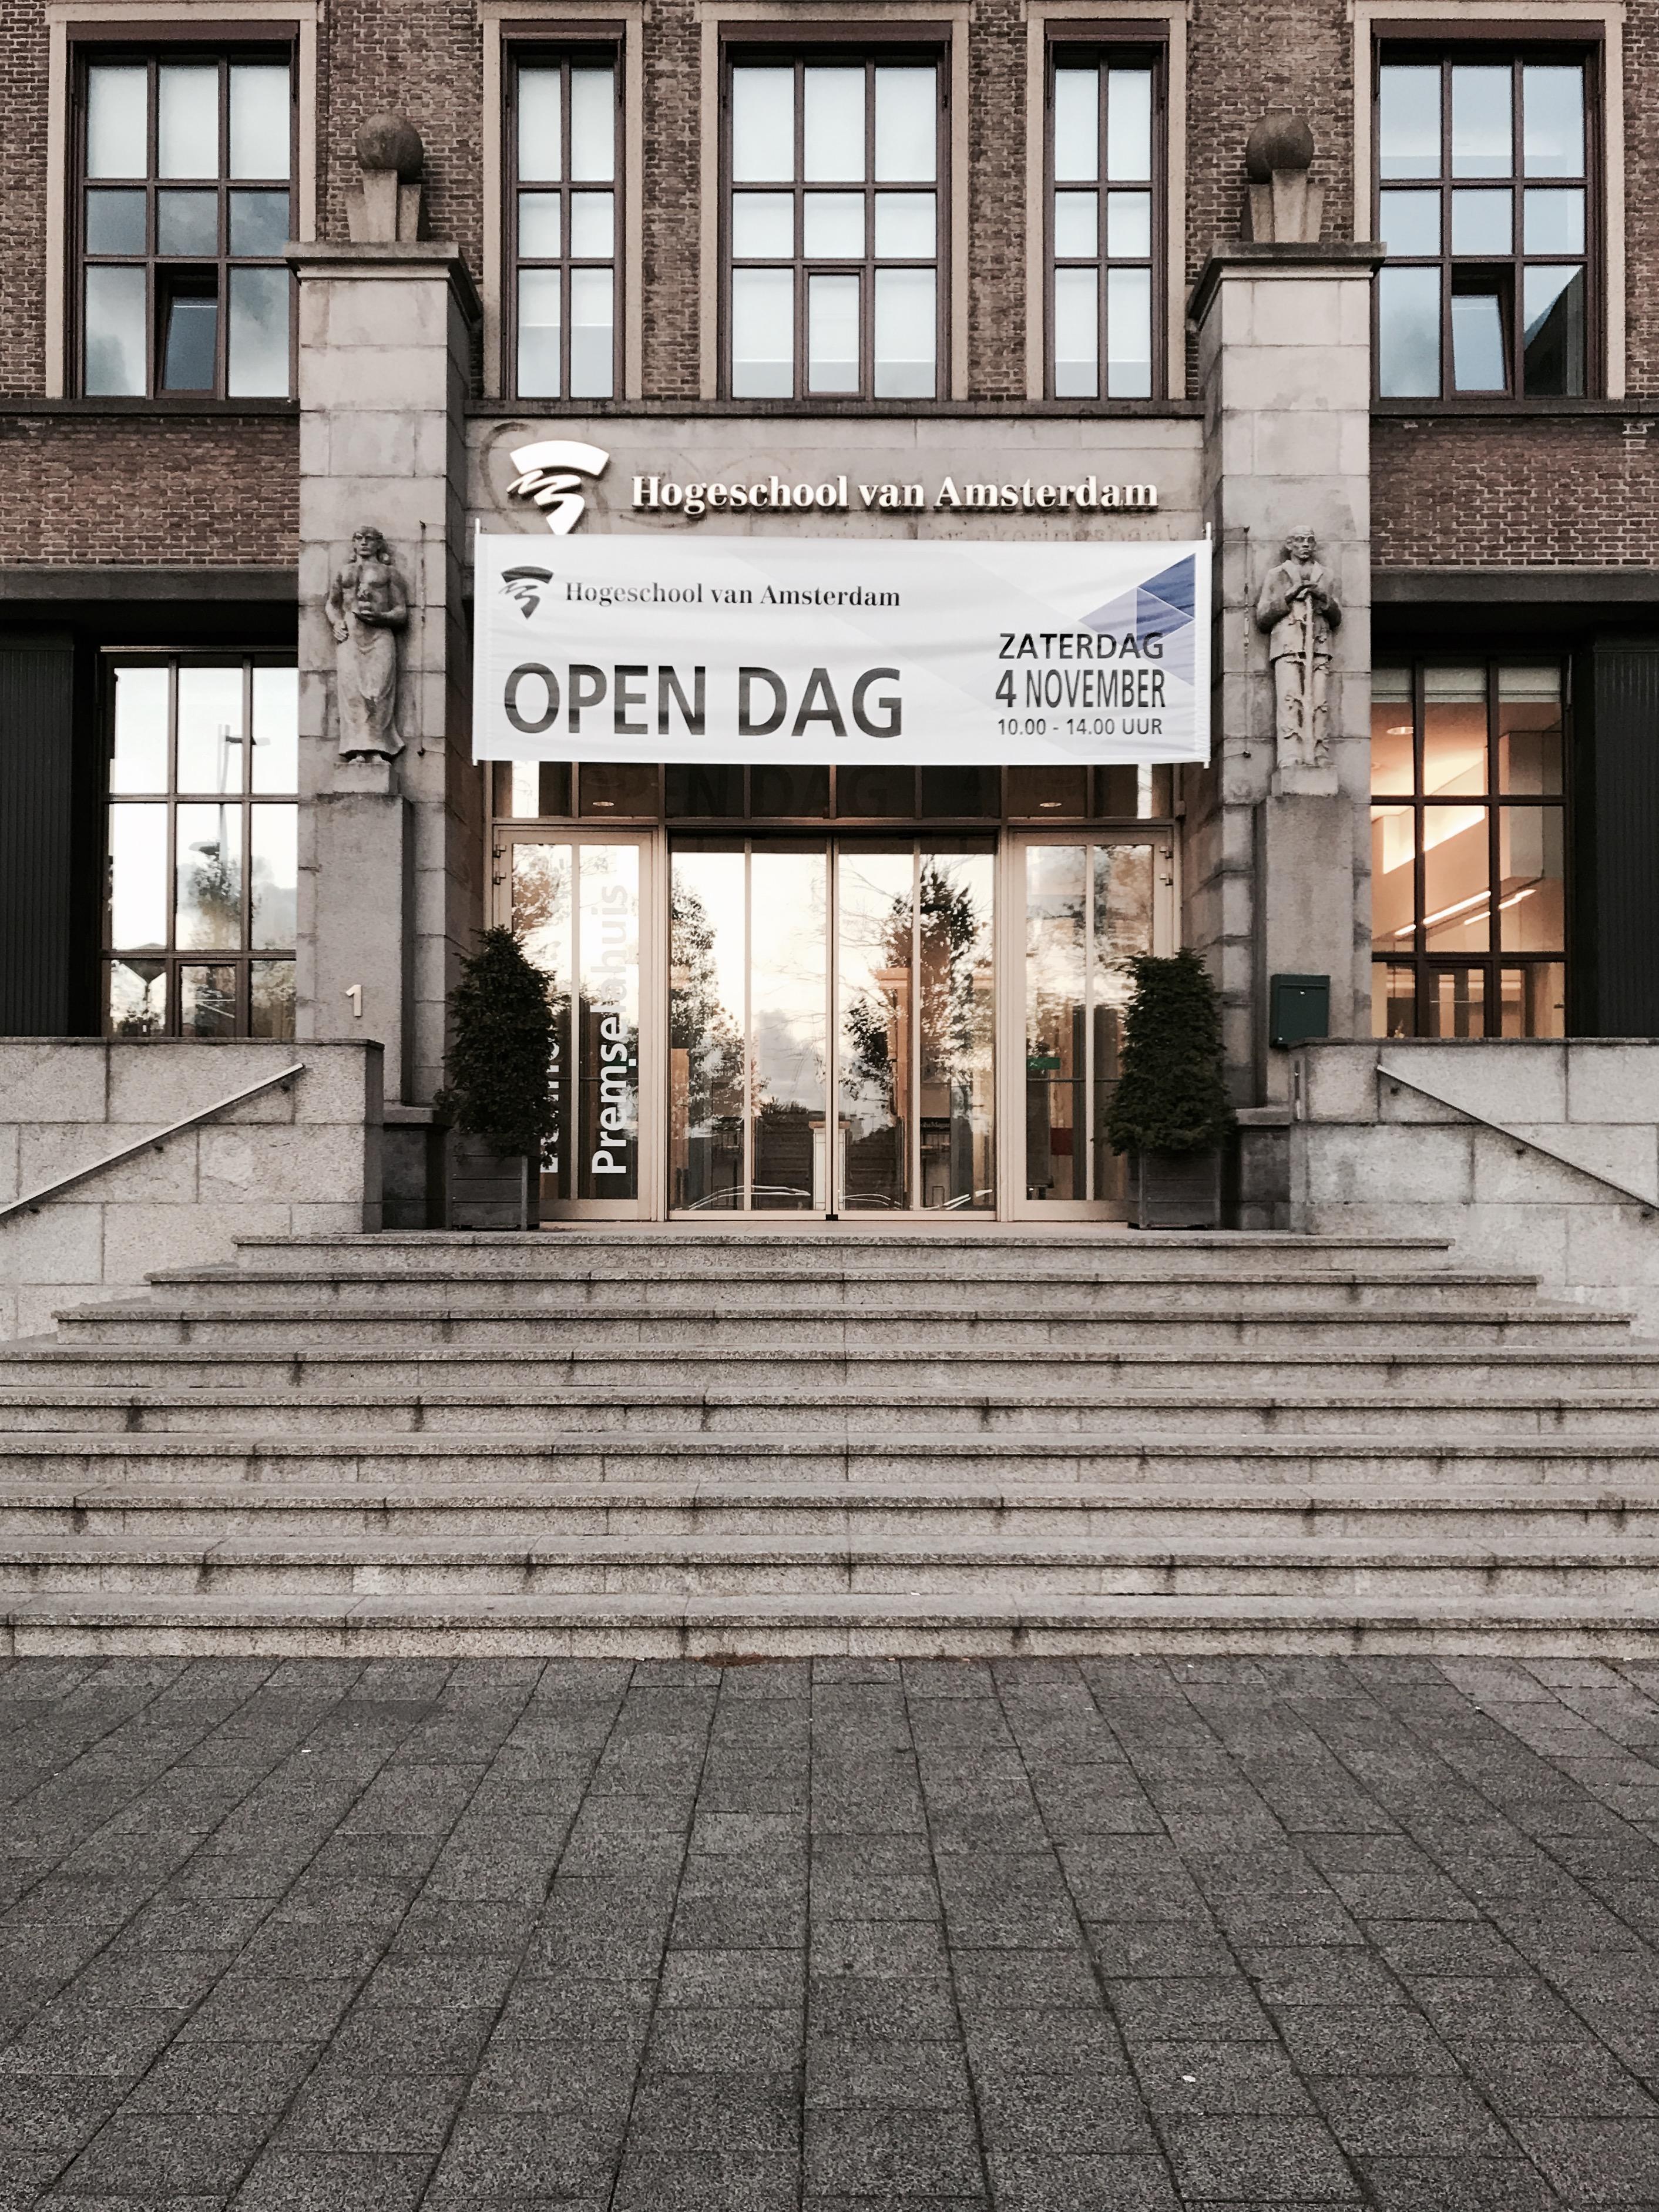 Der Eingang der Hogeschool van Amsterdam